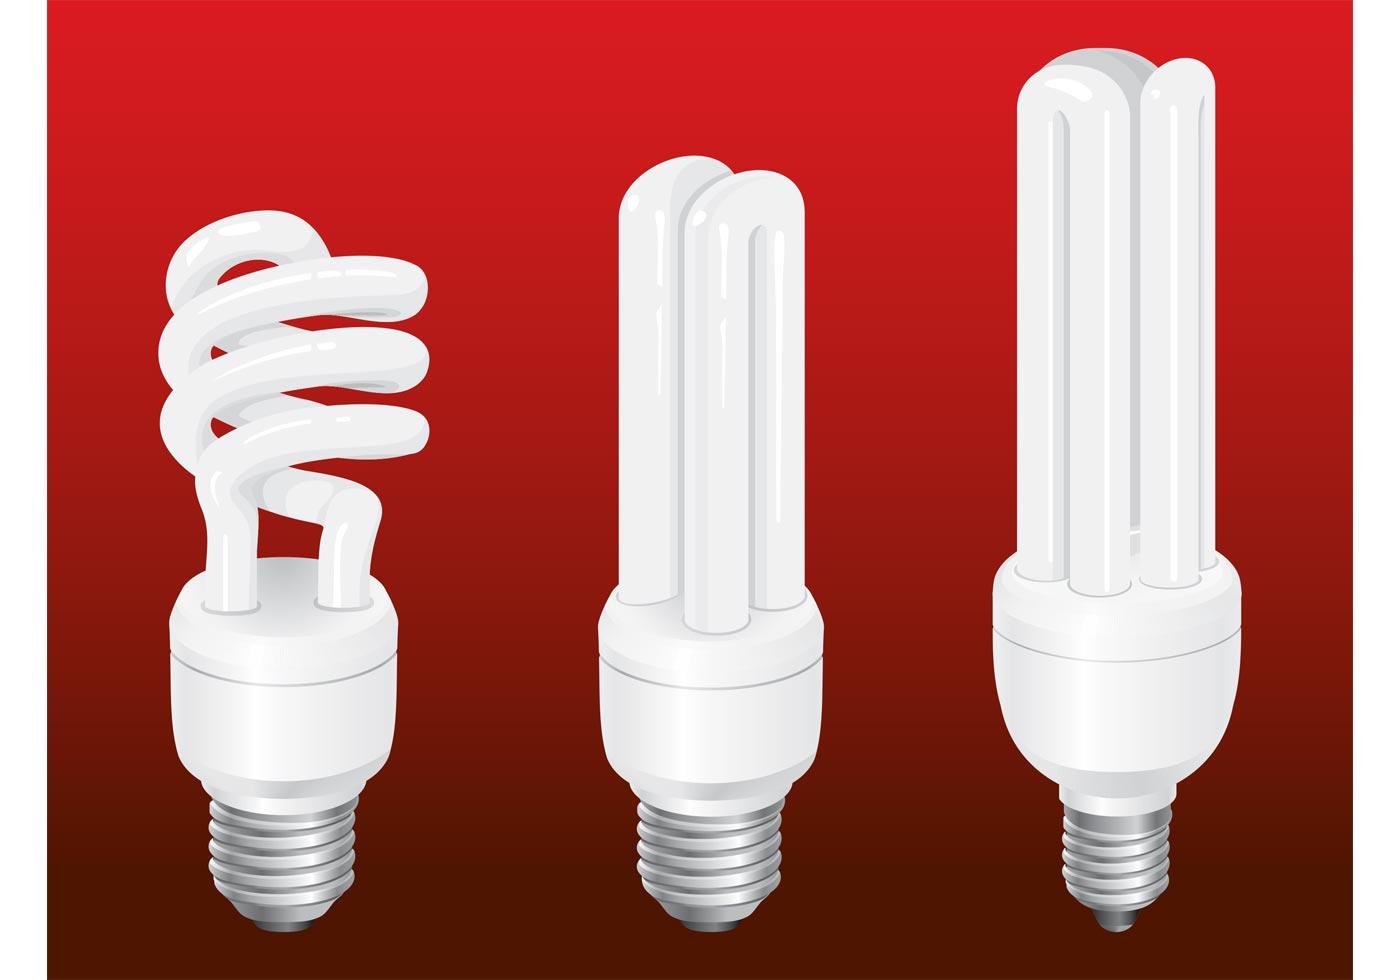 Energy Saving Bulbs Download Free Vector Art Stock